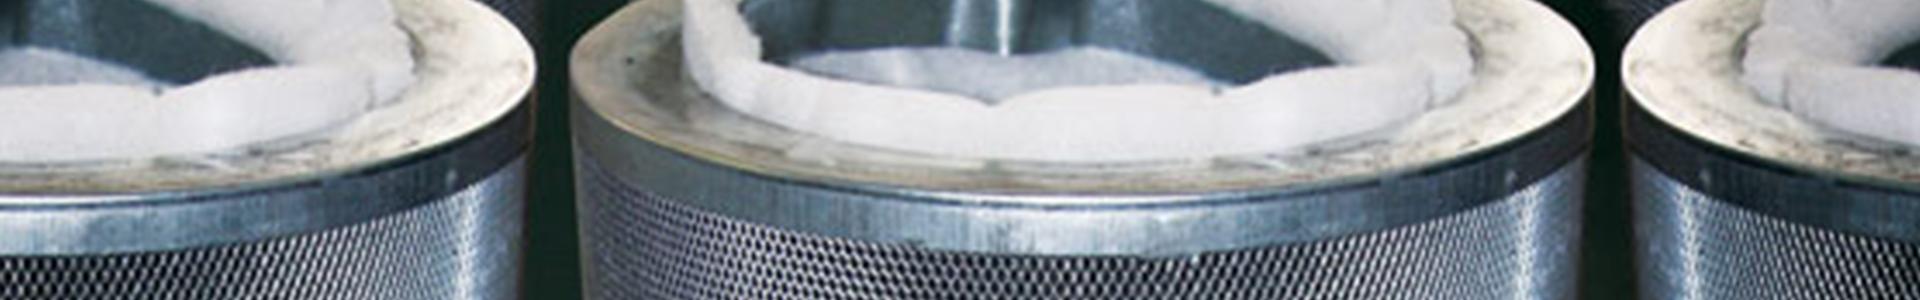 filtri nebbie oleose